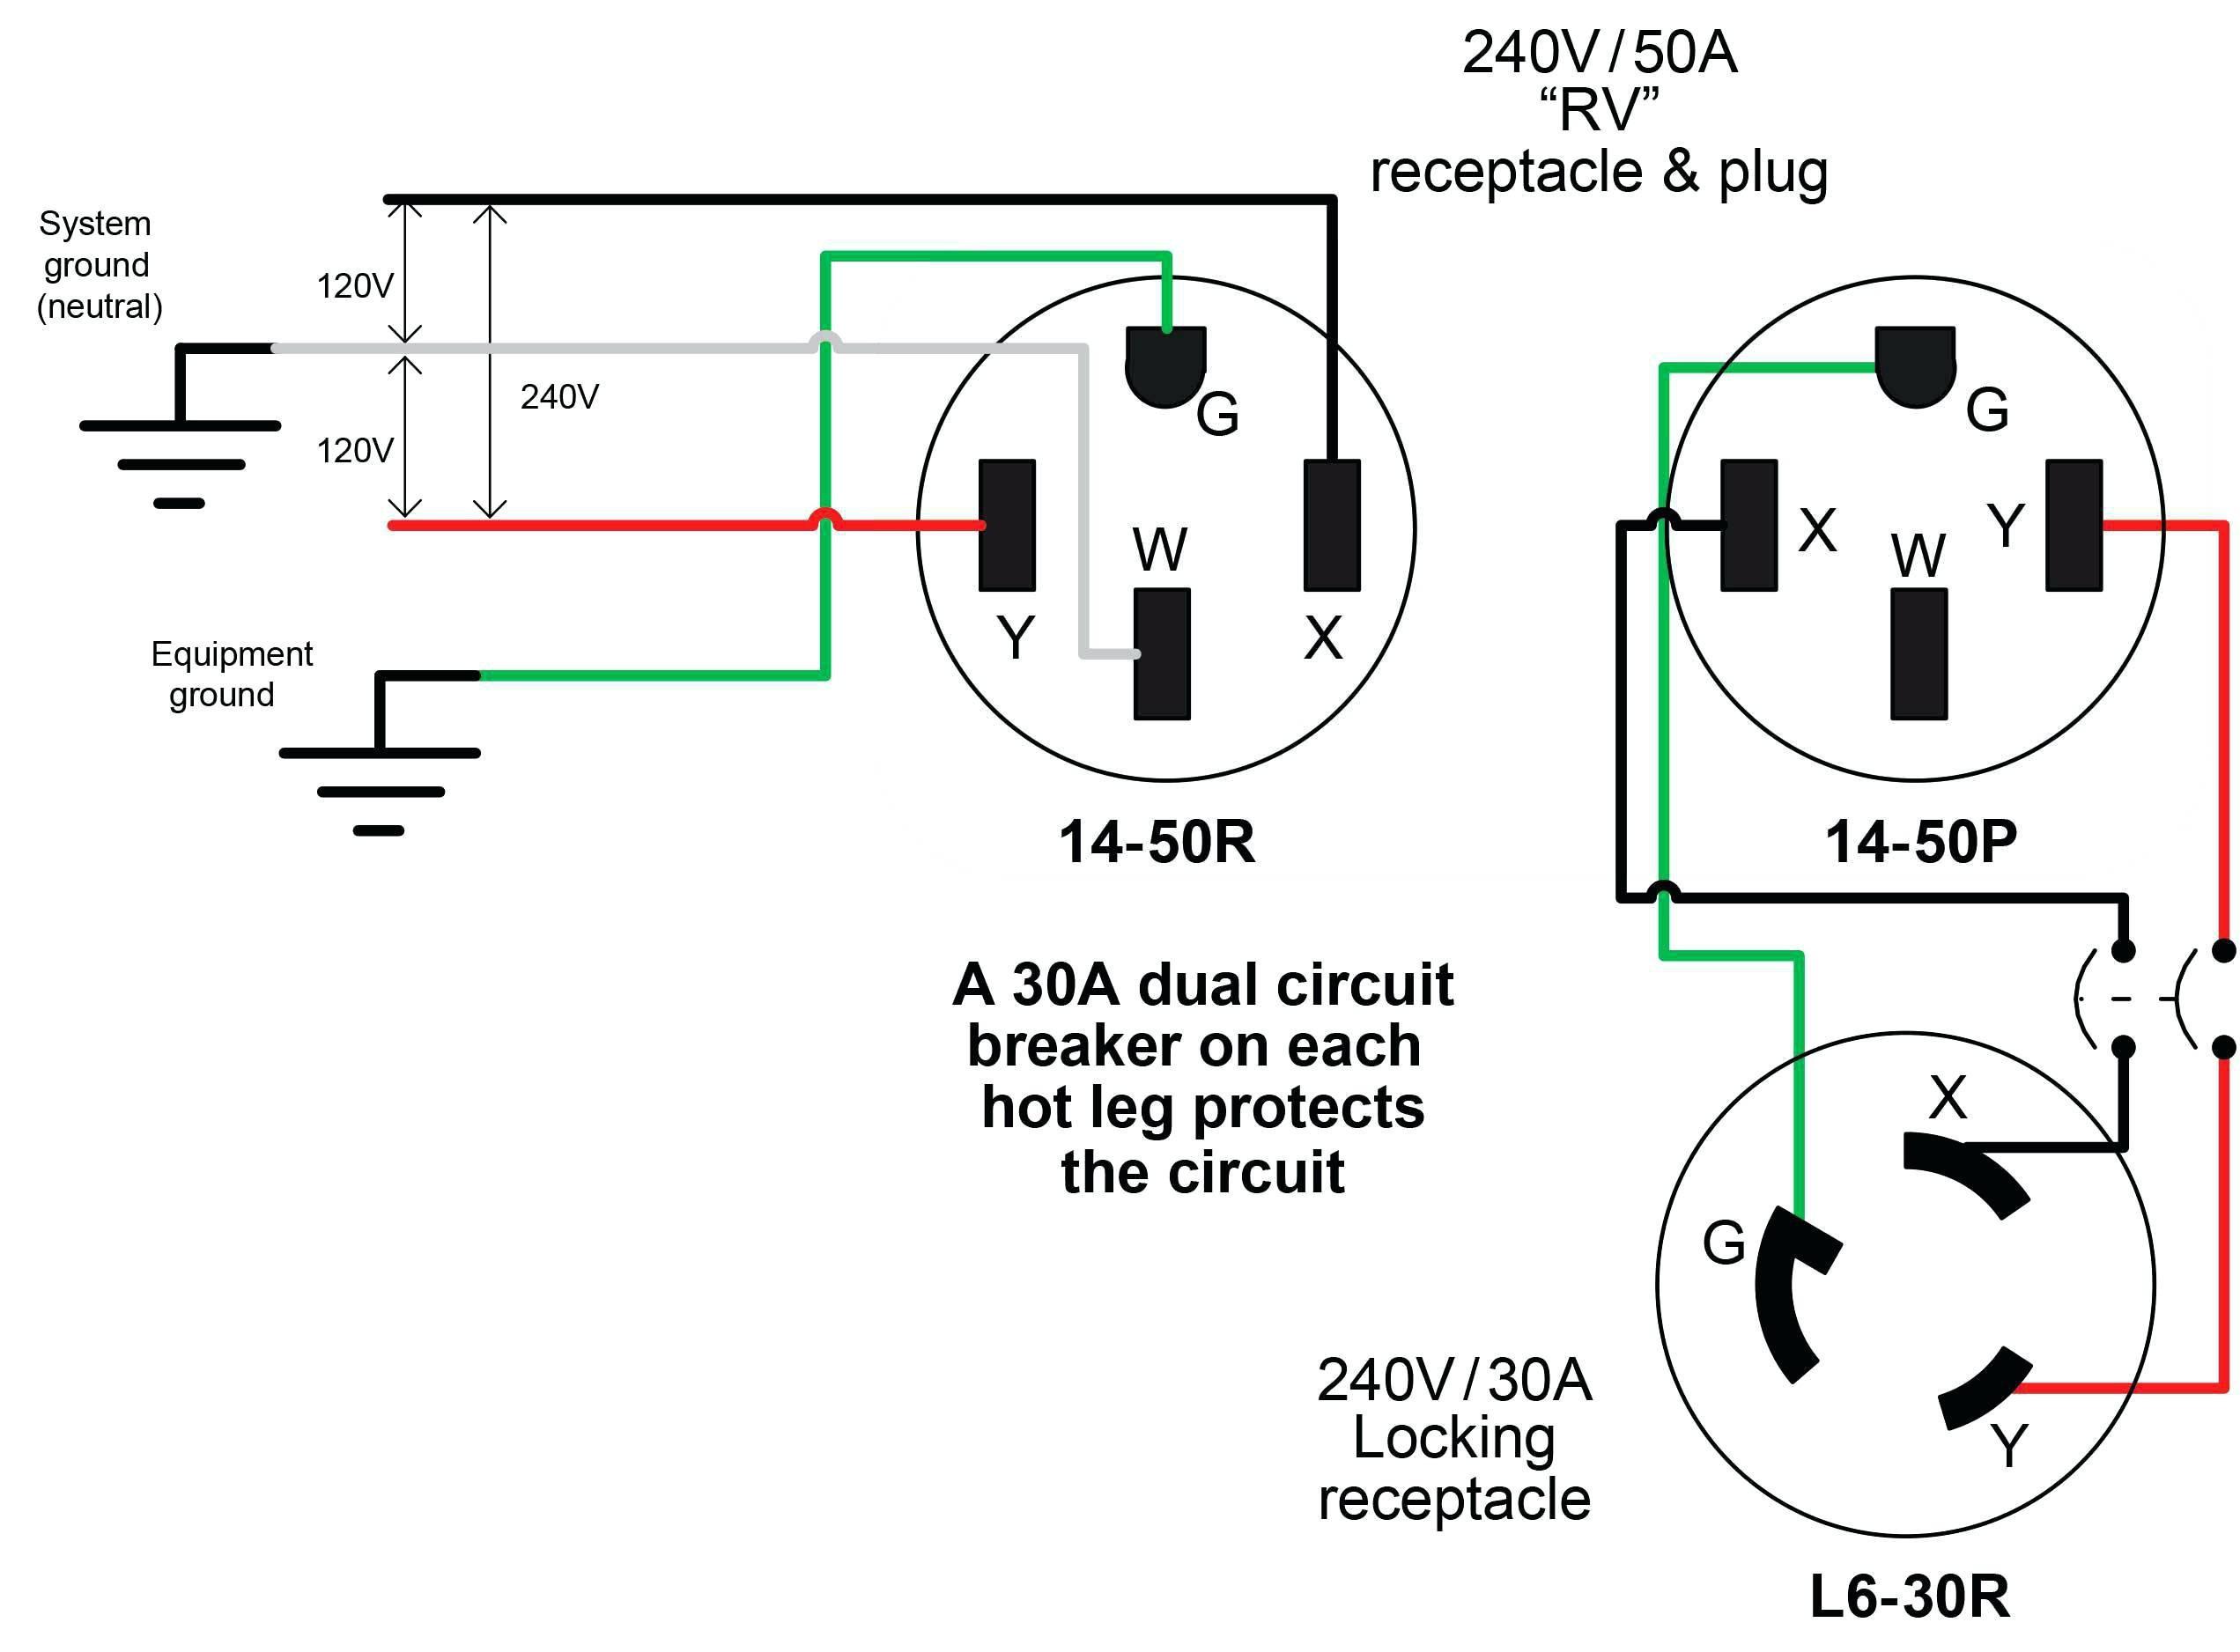 20 Amp Twist Lock Plug Wiring Diagram | Manual E-Books - 3 Prong Twist Lock Plug Wiring Diagram